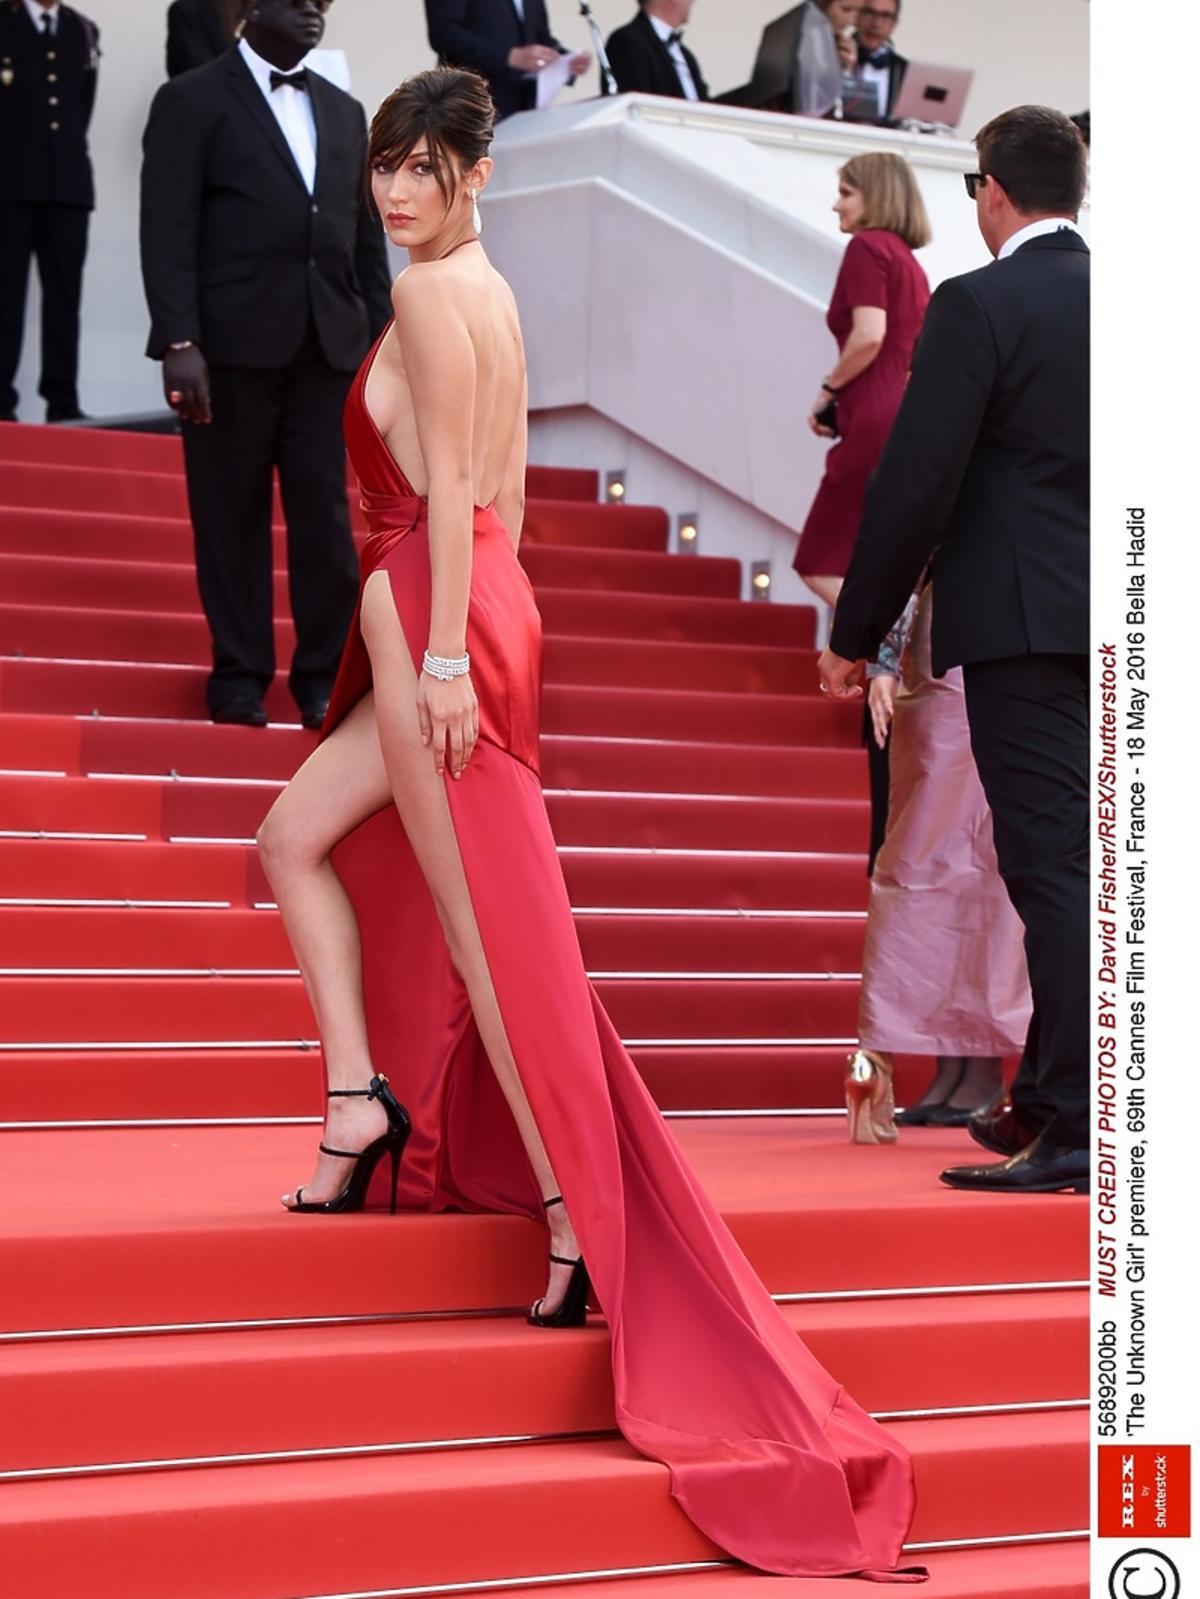 Bella Hadid na schodach